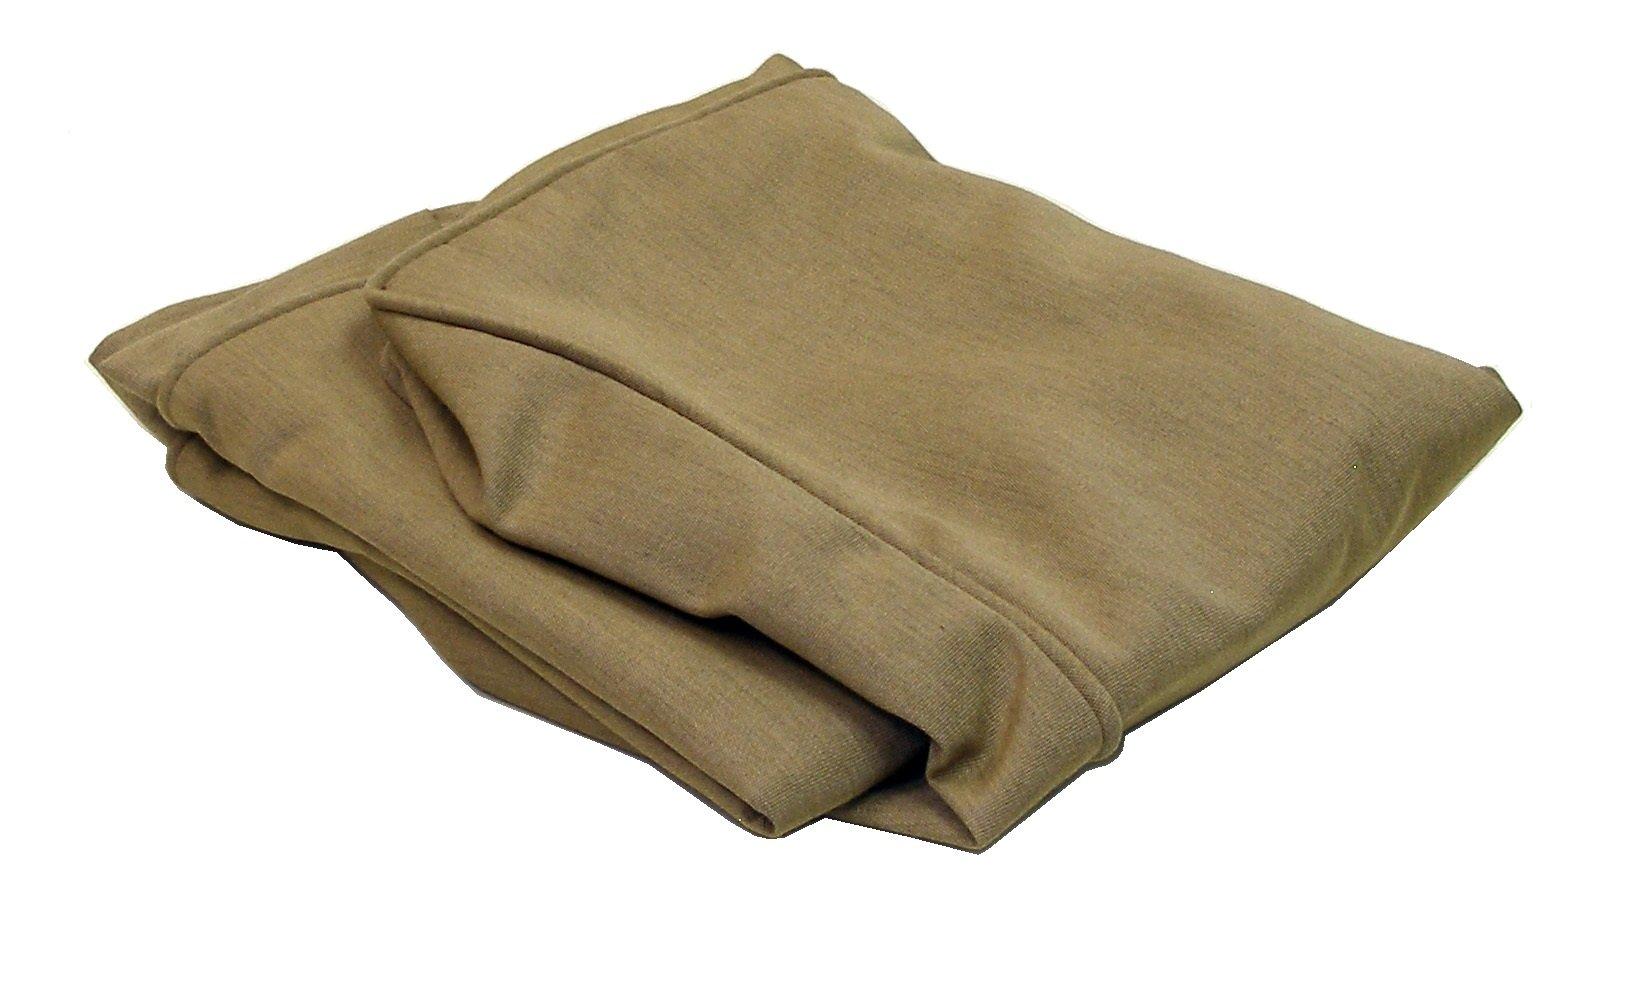 ATC Sunbrella Fabric Cushion Cover for Tatta Ottoman, Heather Beige by American Trading Company